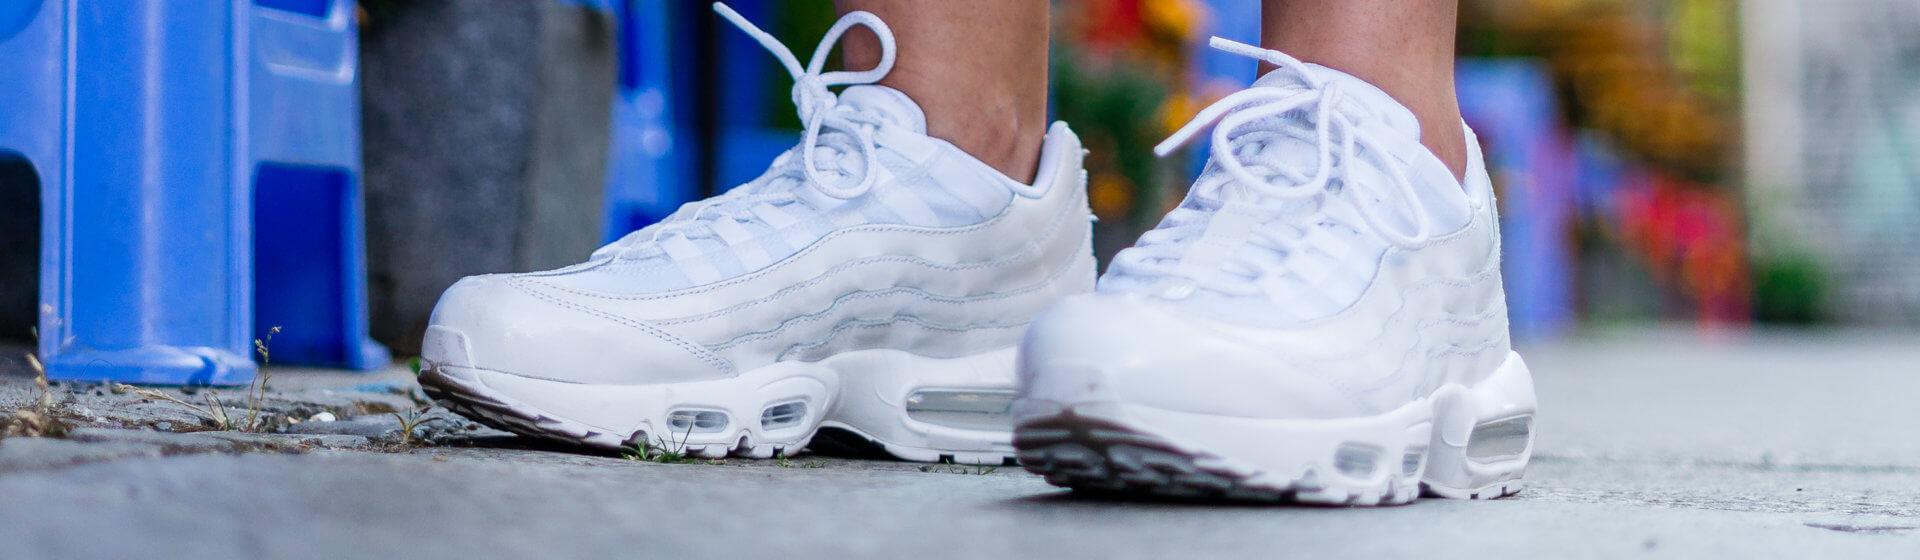 Sneaker Trends für den Herbst